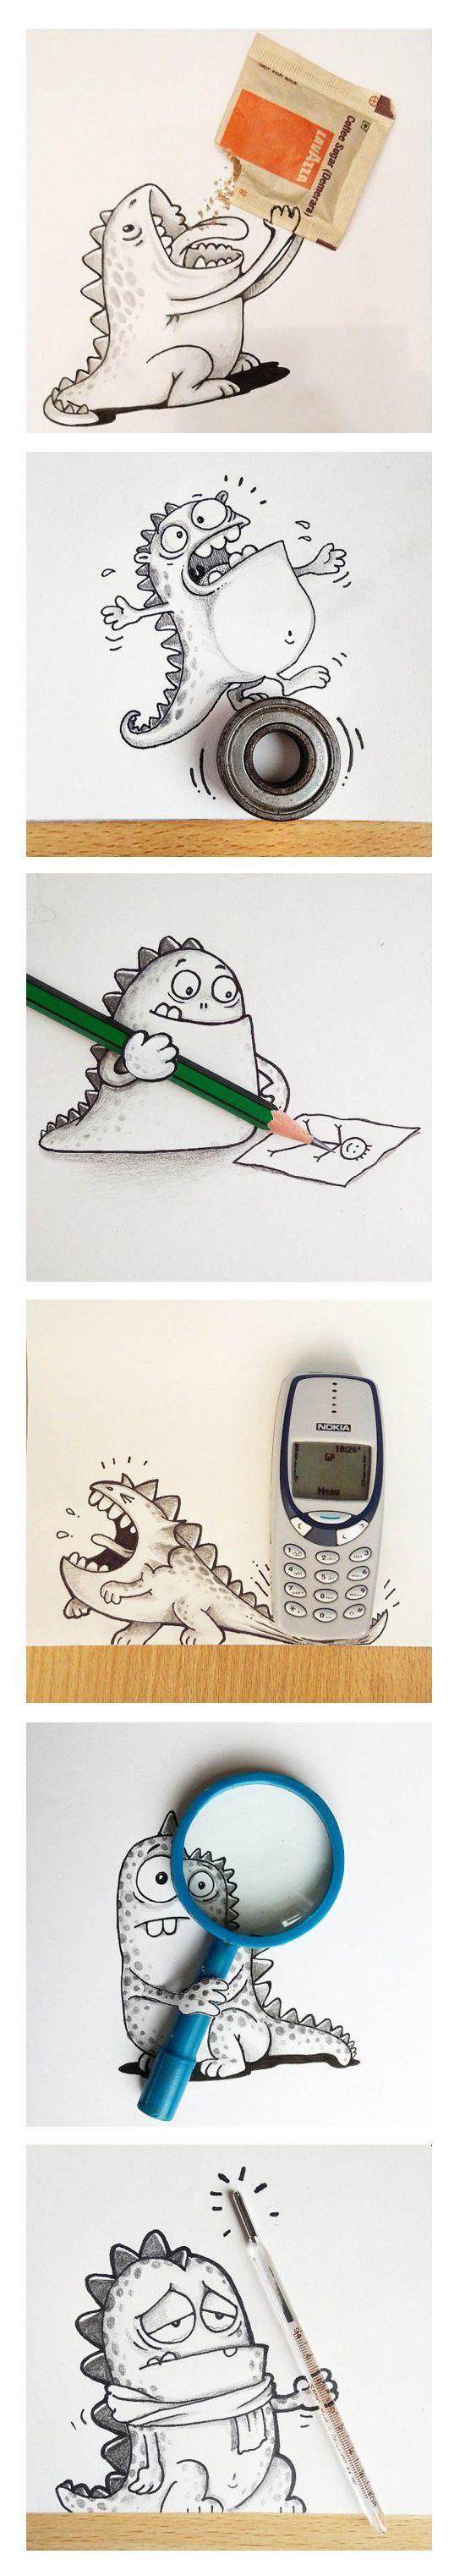 manik r ratan y sus dibujos casi reales - #illustration #art #creativity